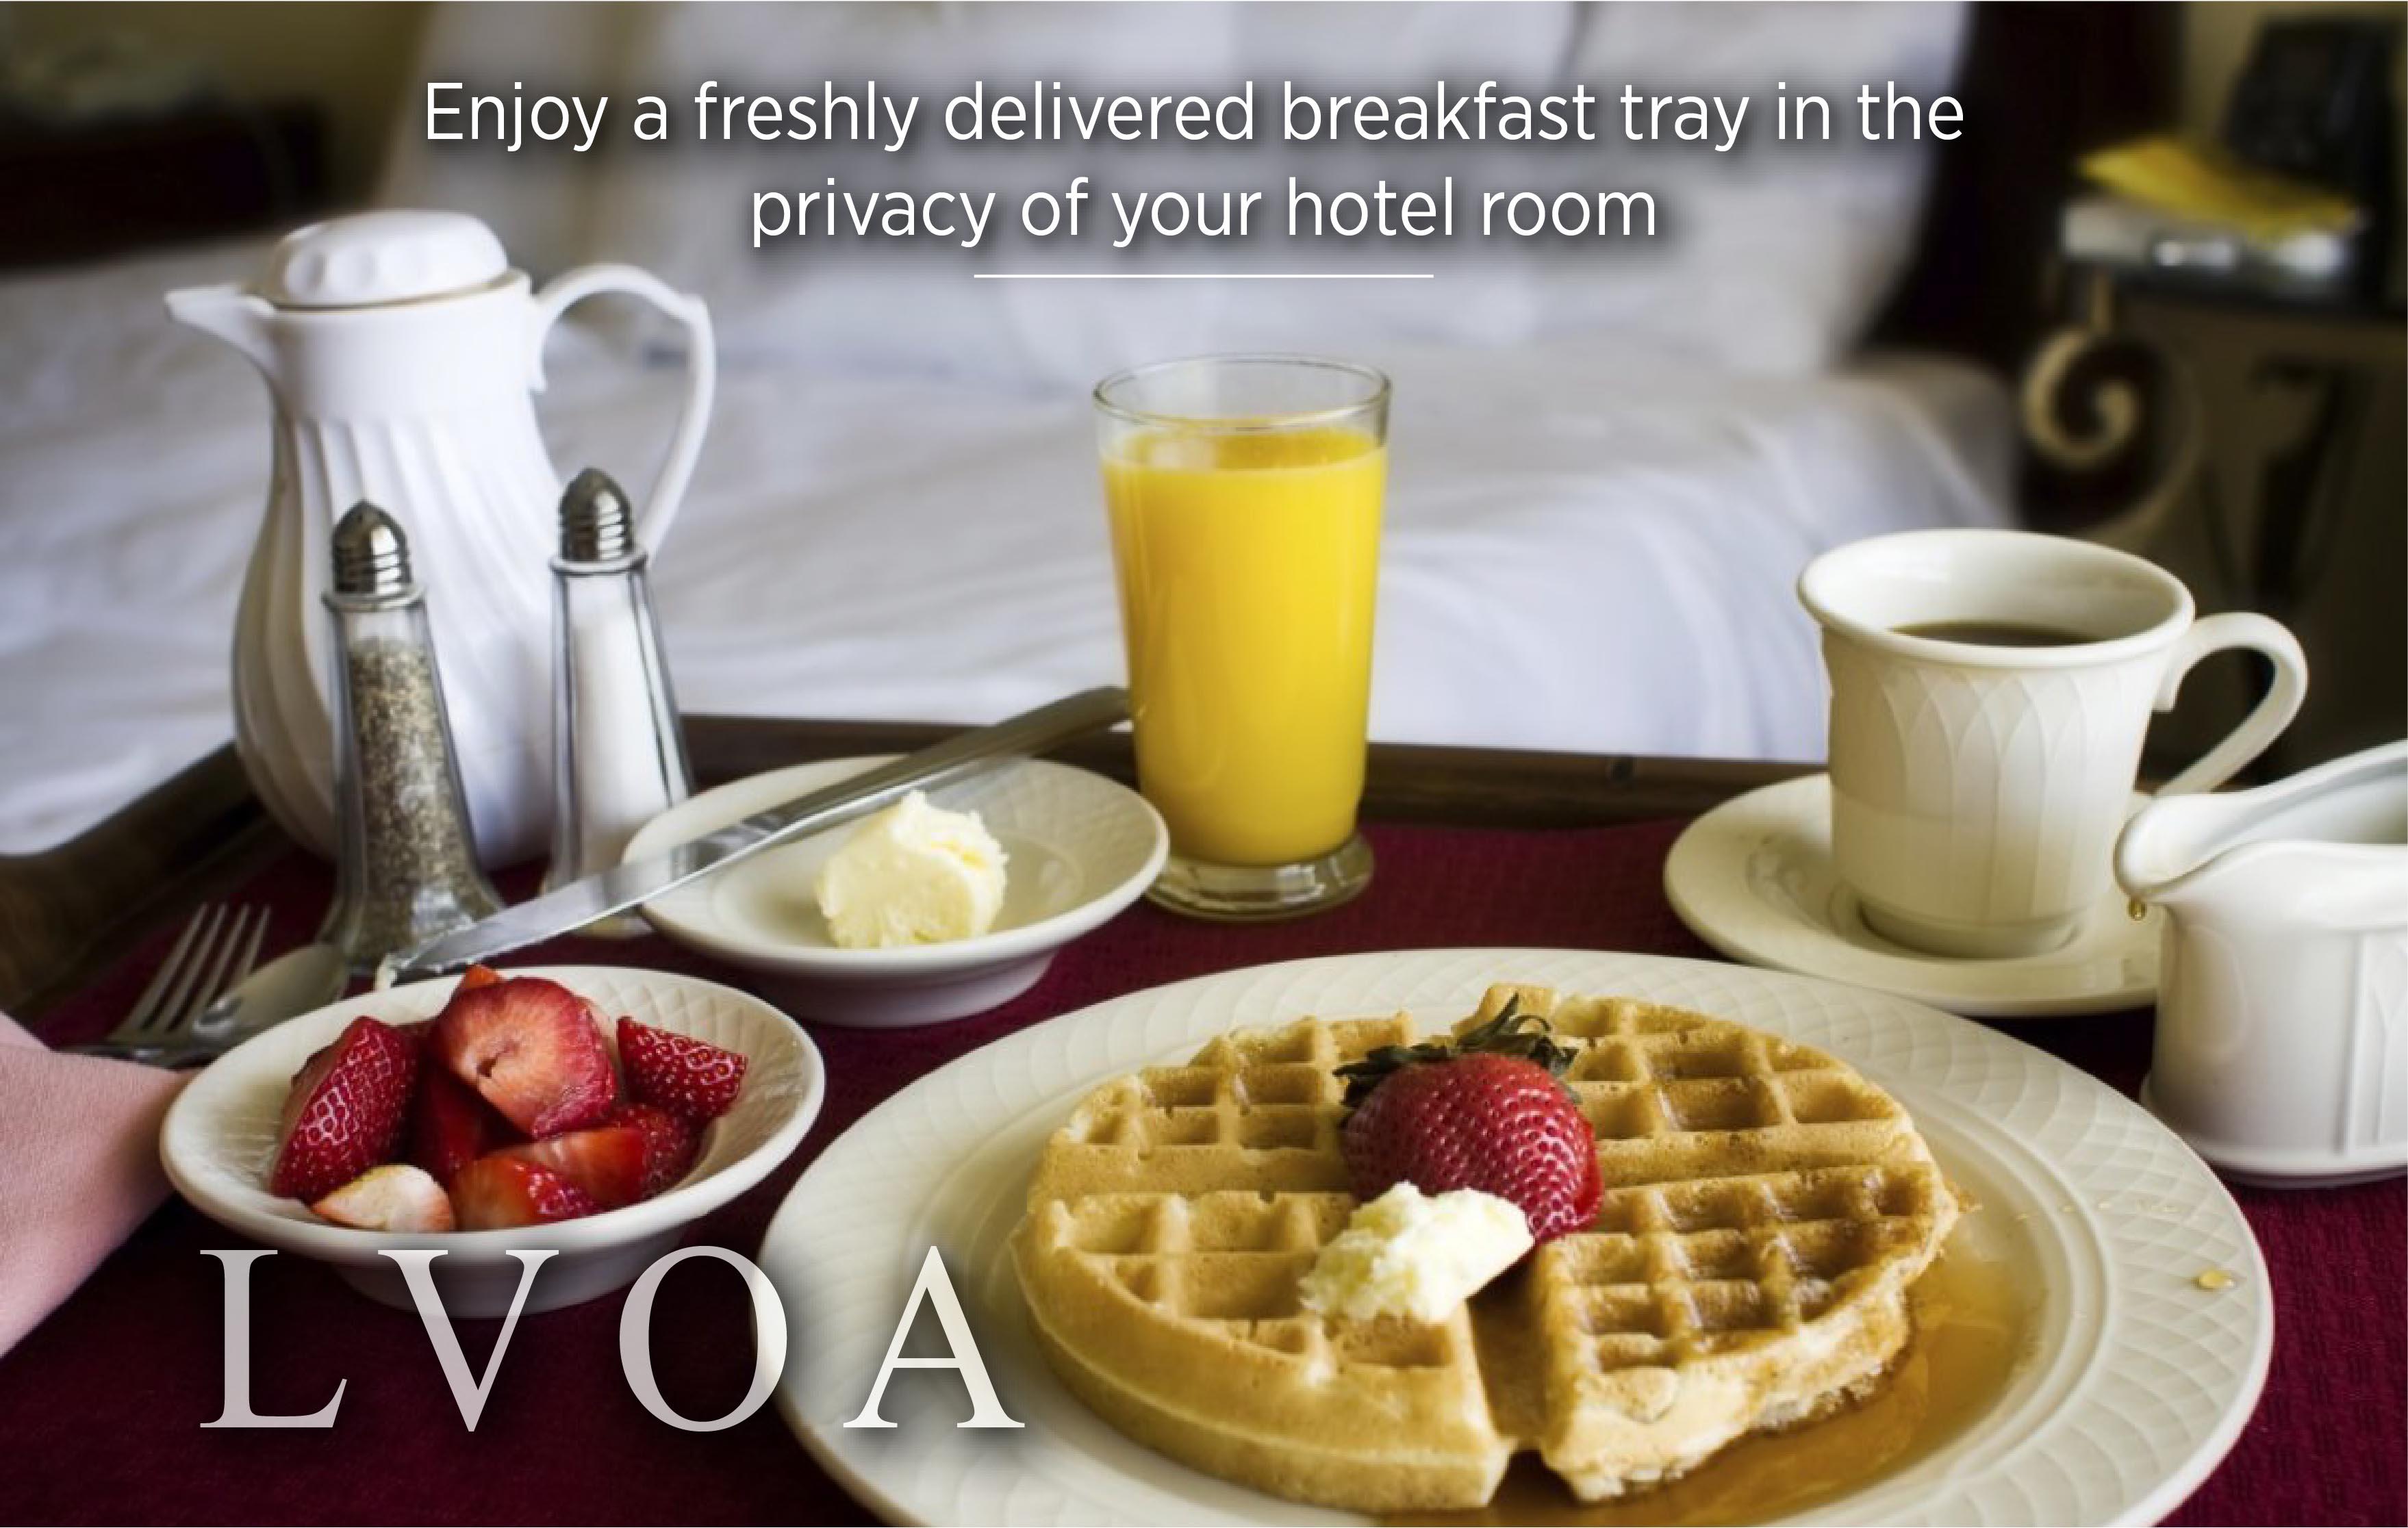 Pix 2 caption Room service reveletions